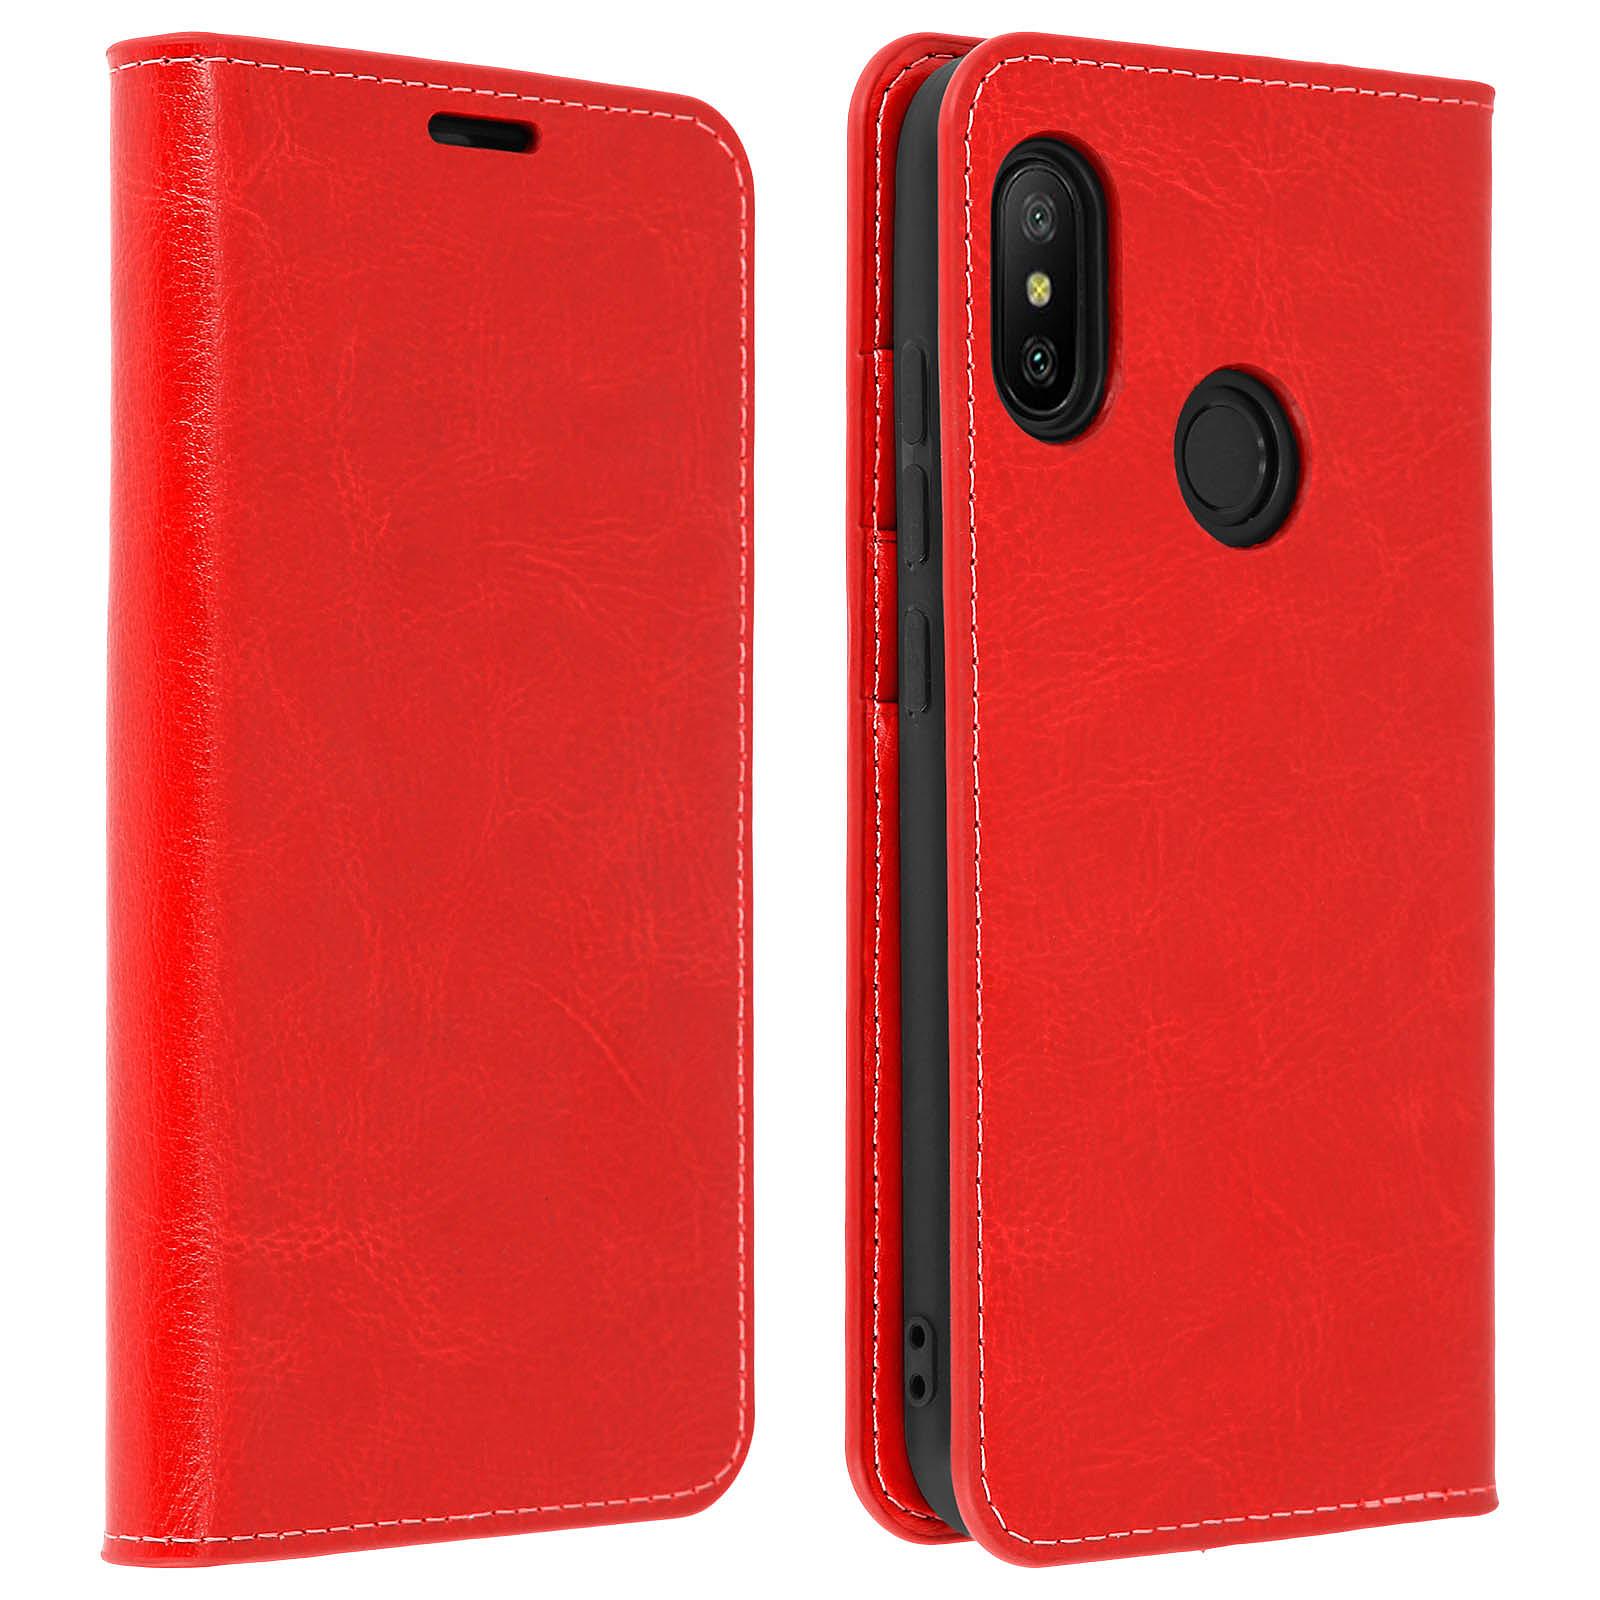 Avizar Etui folio Rouge Cuir Véritable pour Xiaomi Mi A2 Lite